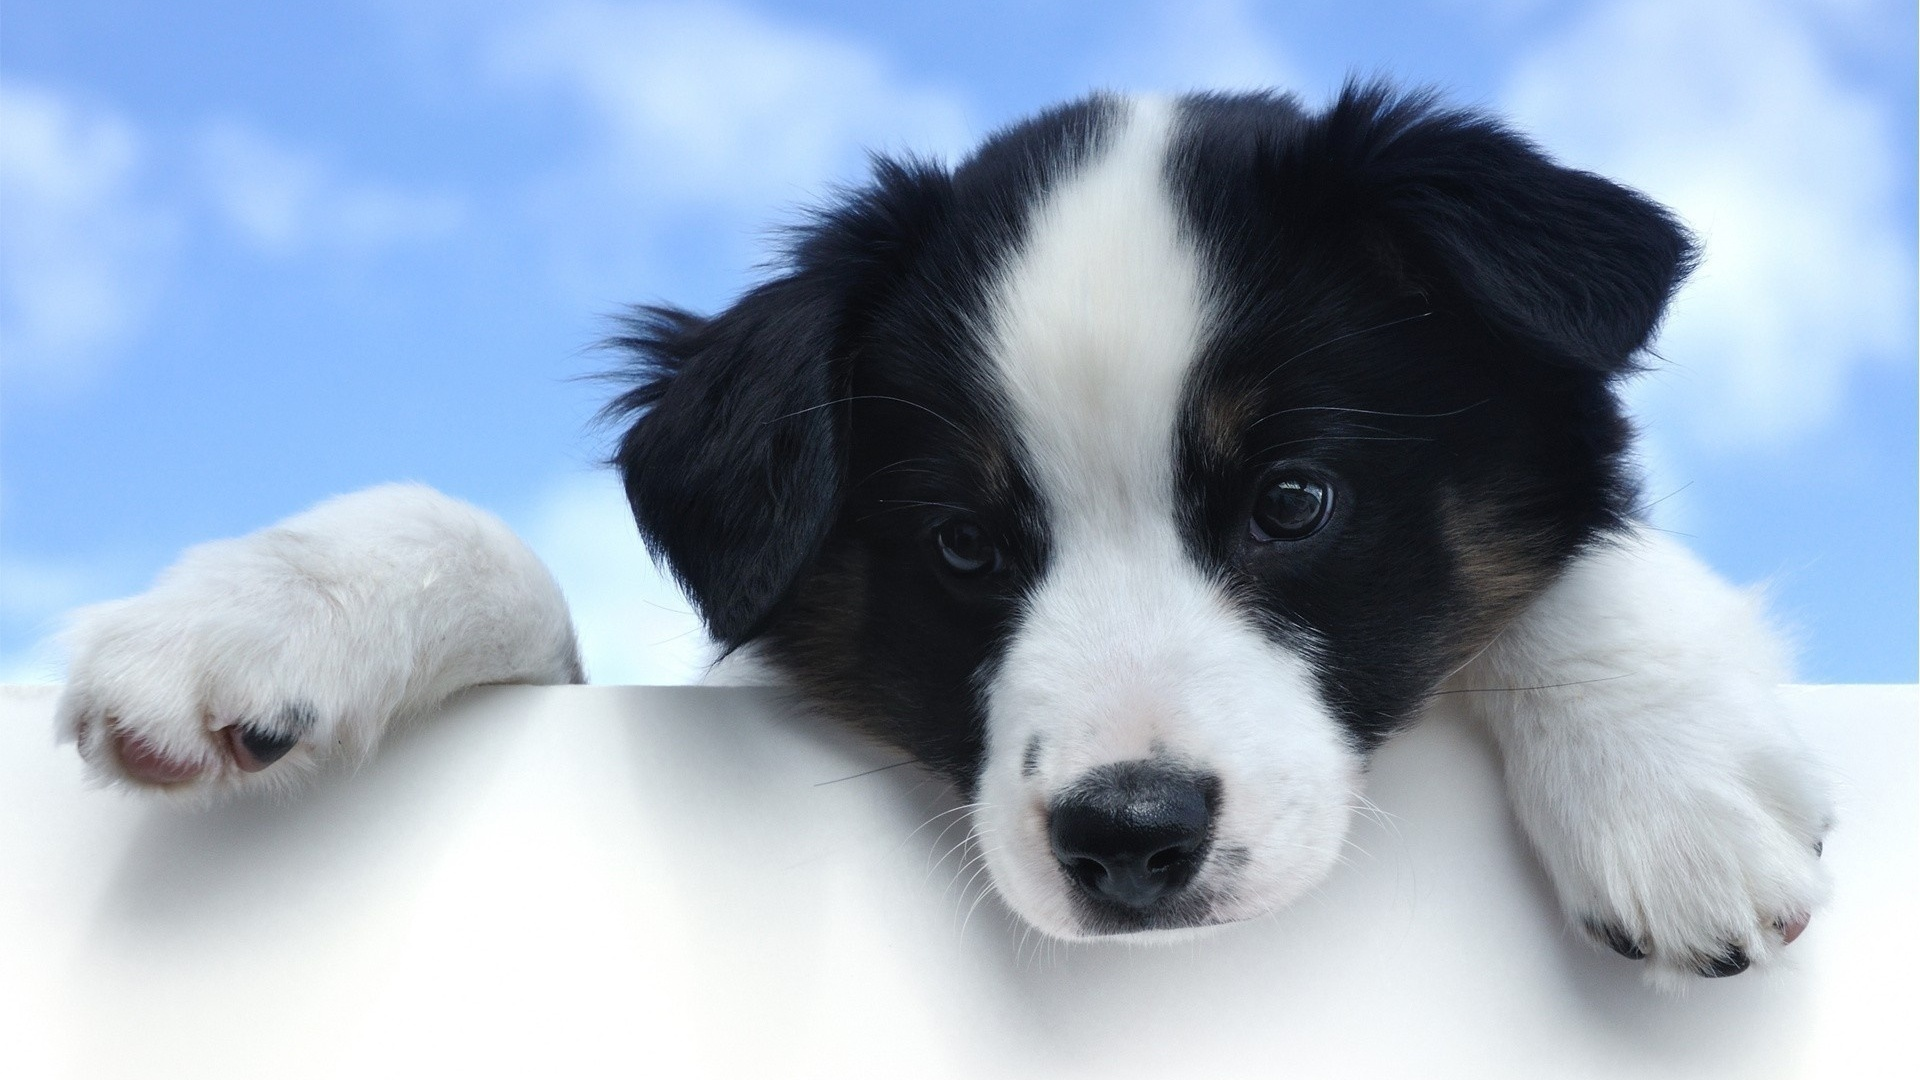 Description: The Wallpaper. Description: The Wallpaper above is Black white dog ...